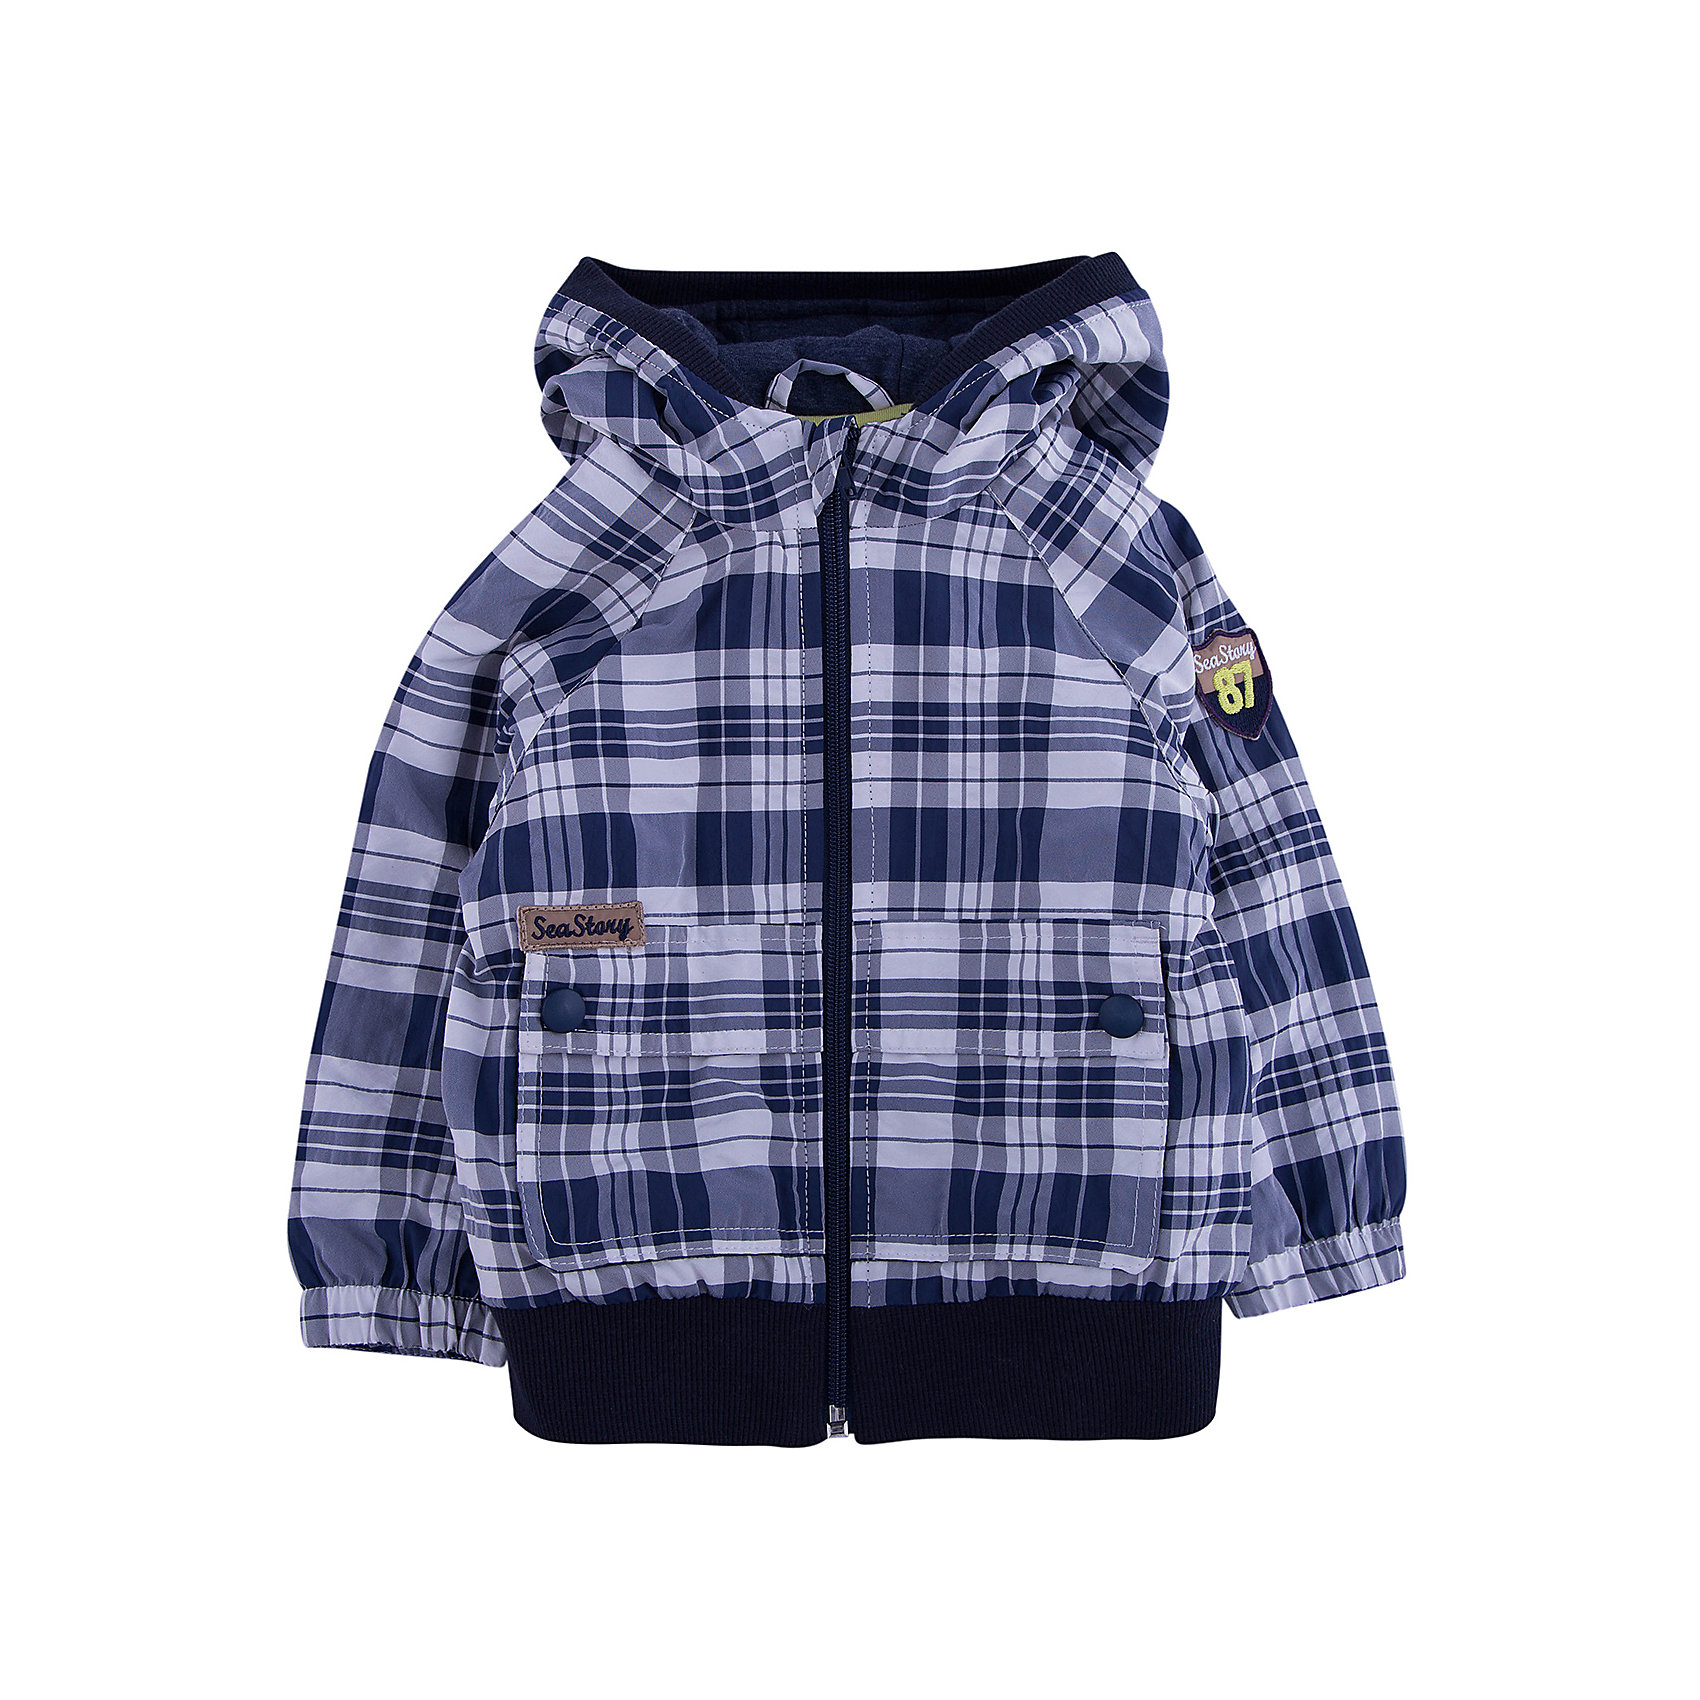 Куртка для мальчика WojcikВерхняя одежда<br>Куртка для мальчика Wojcik<br>Состав:<br>Полиэстер 51% Полиамид 49%<br><br>Ширина мм: 356<br>Глубина мм: 10<br>Высота мм: 245<br>Вес г: 519<br>Цвет: белый<br>Возраст от месяцев: 18<br>Возраст до месяцев: 24<br>Пол: Мужской<br>Возраст: Детский<br>Размер: 92,68,74<br>SKU: 5588678